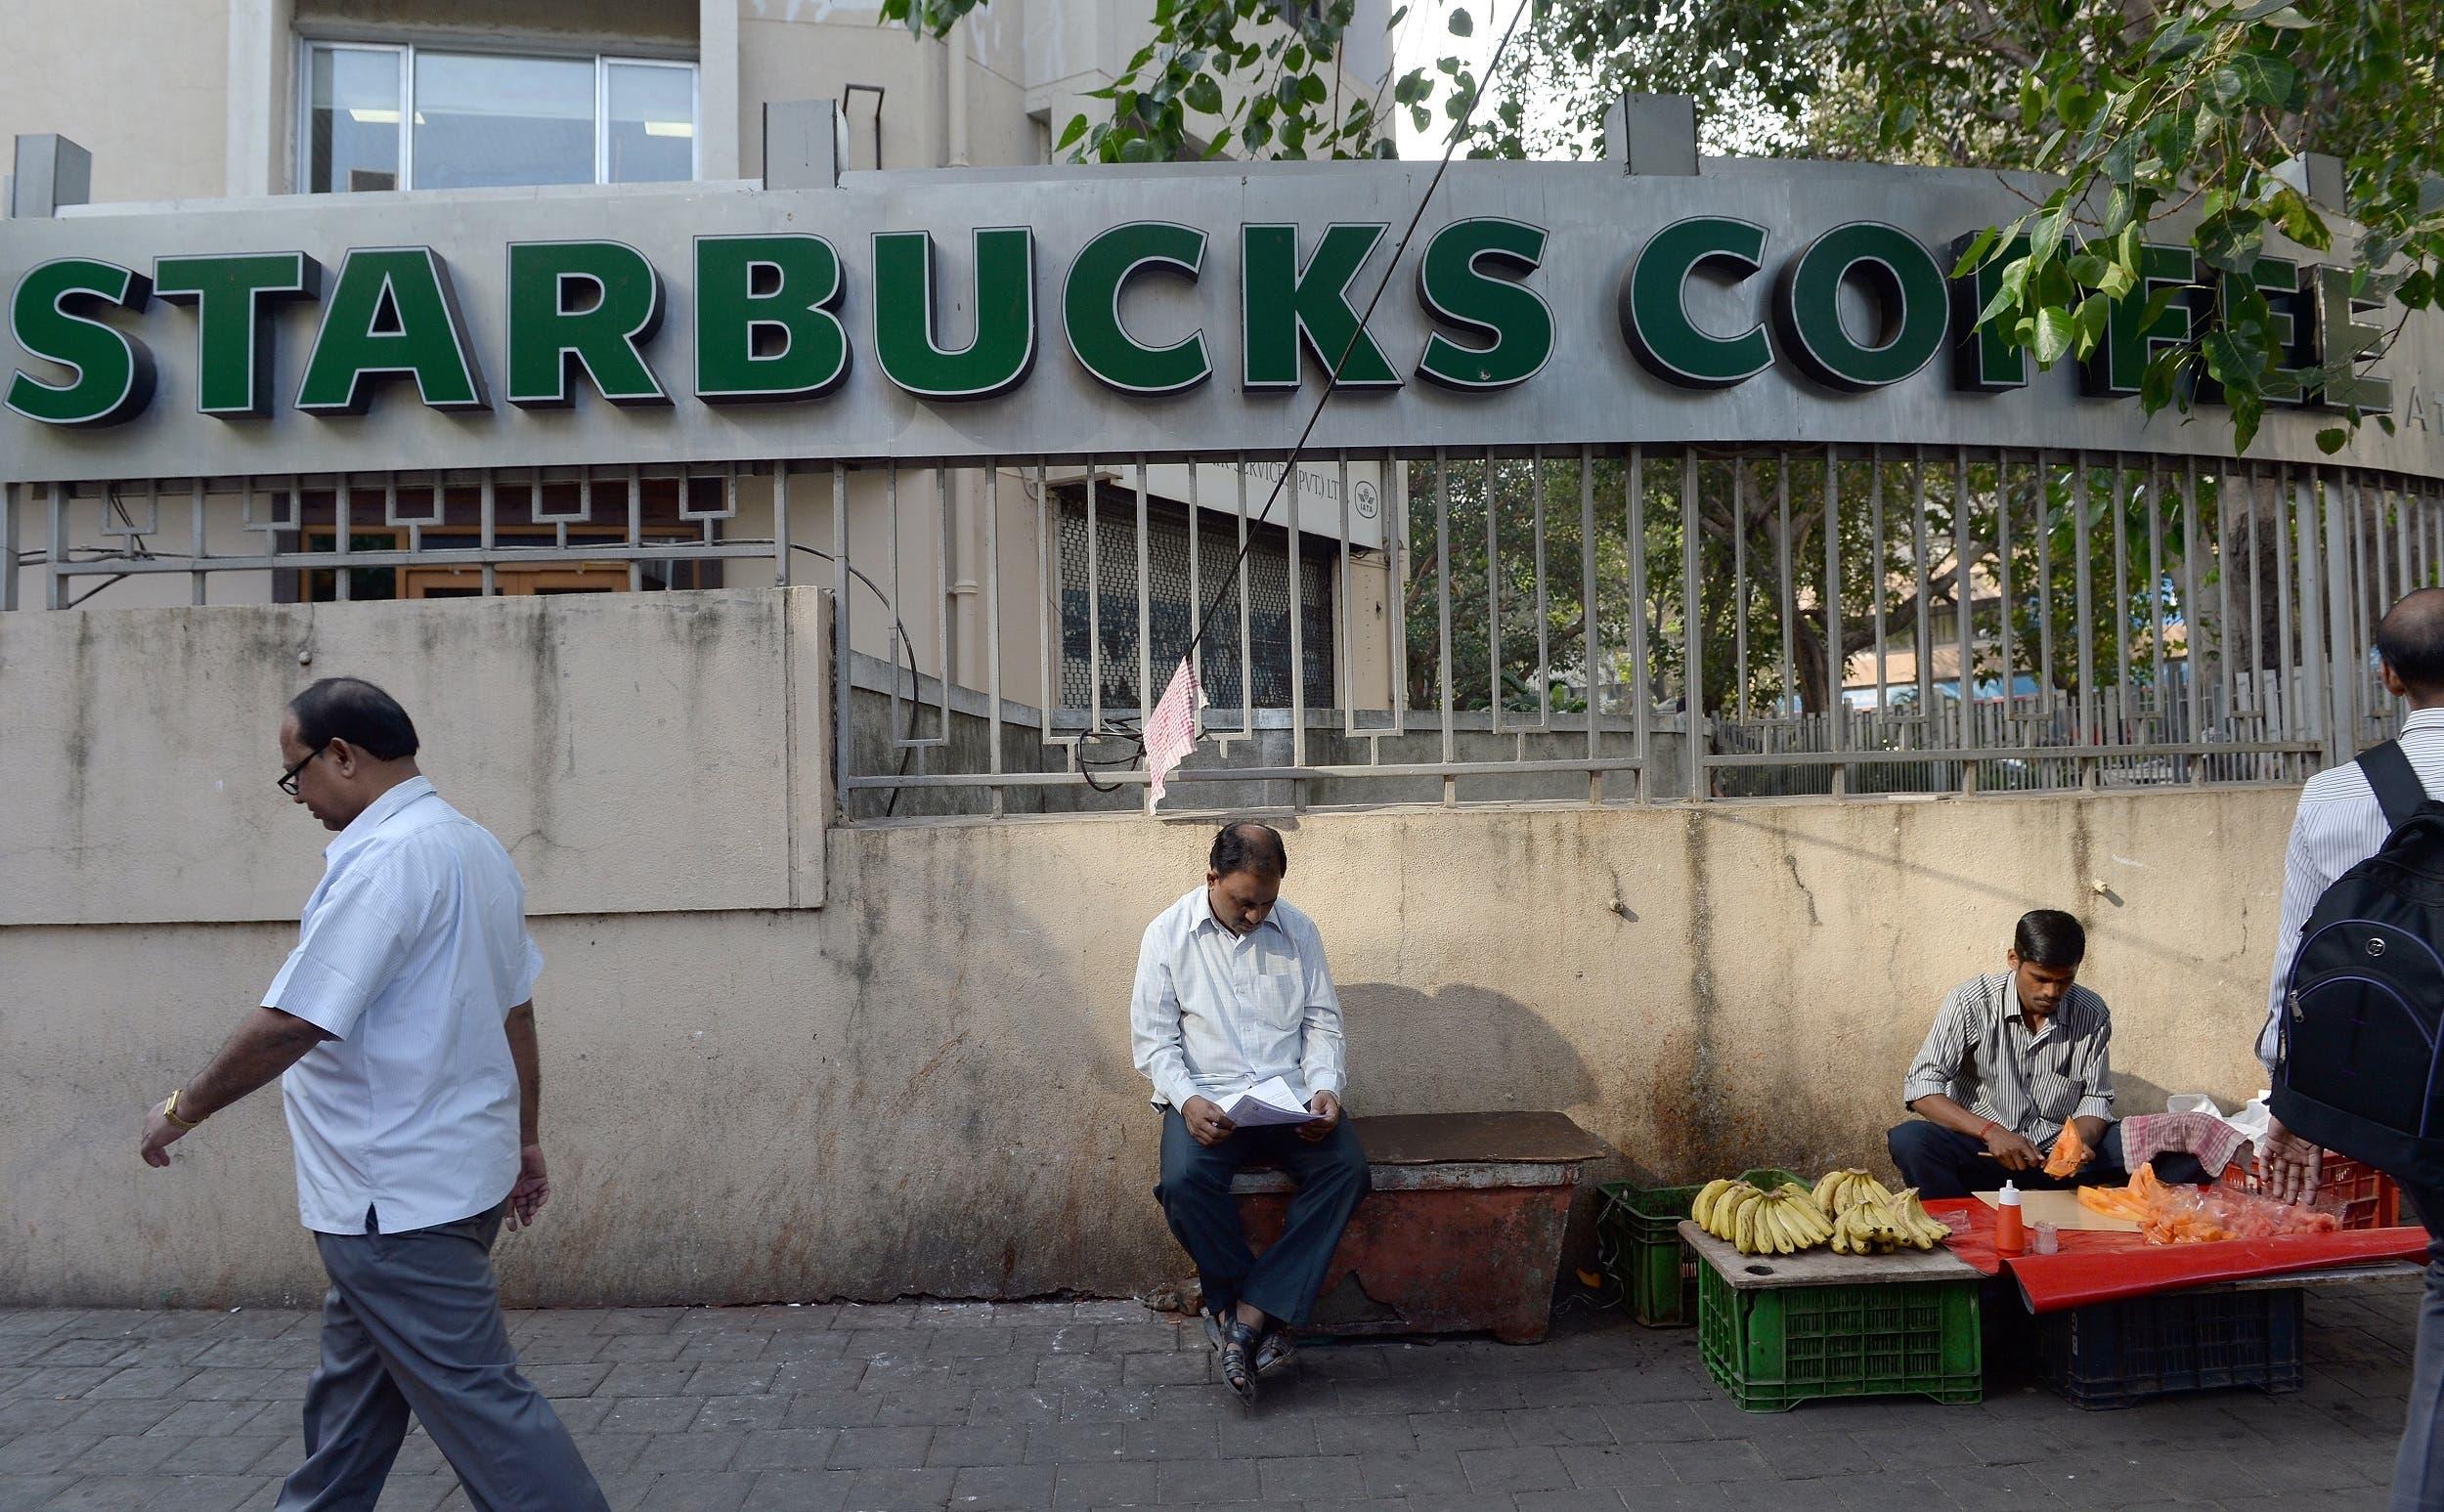 Indian pedestrians walk past a Starbucks Coffee shop in Mumbai on January 15, 2016. (AFP)